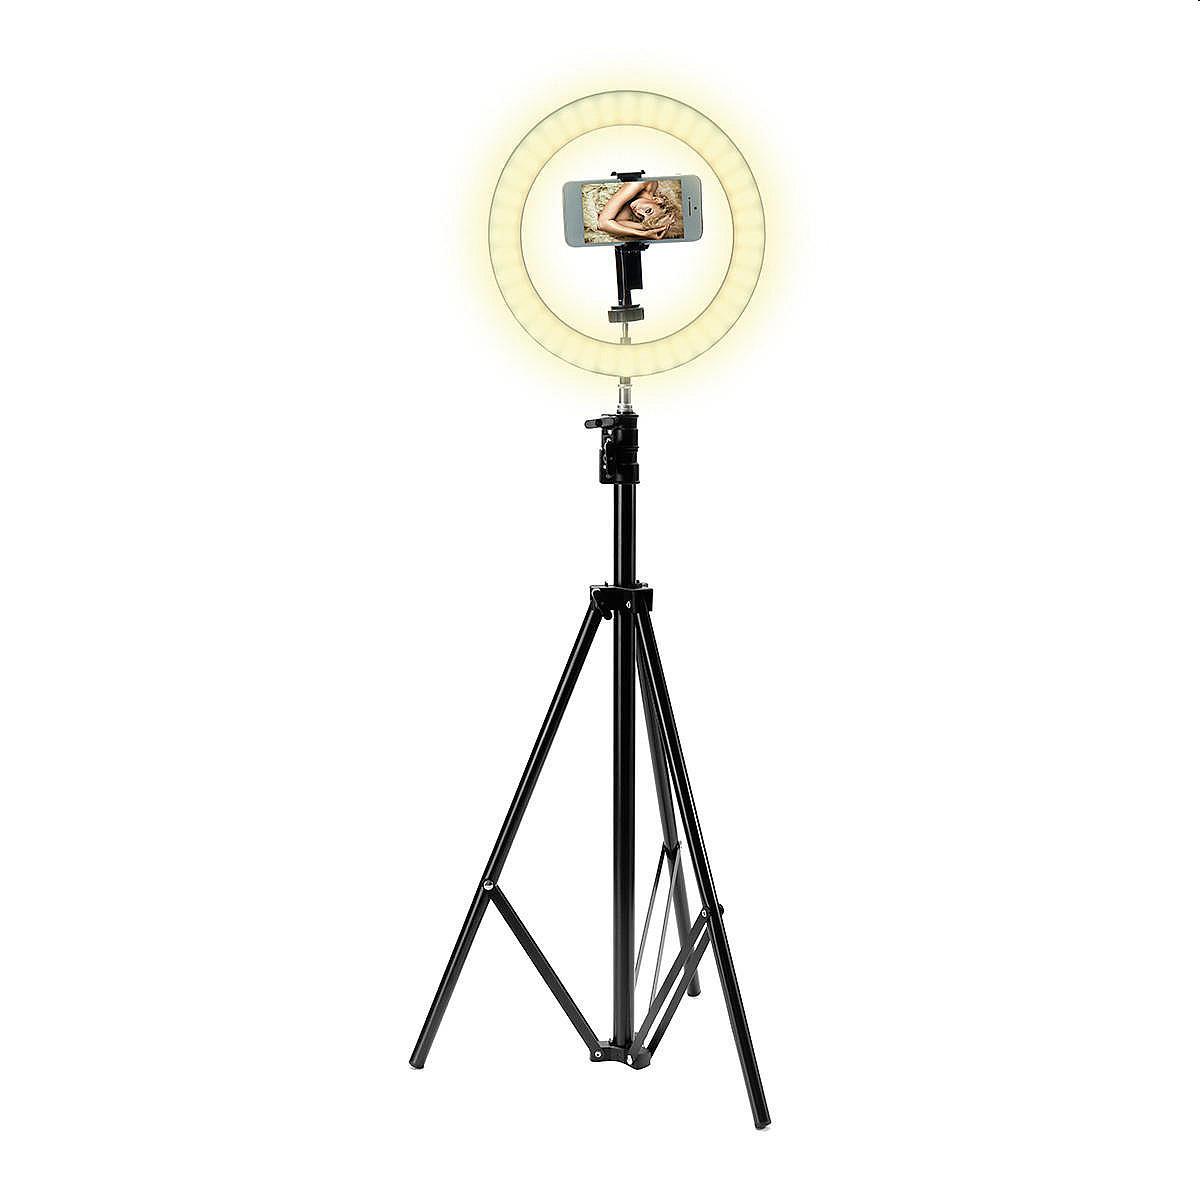 Makyaj Çekim Ring Light Selfie Işık  Işık  Stand 2 METRE AYAK